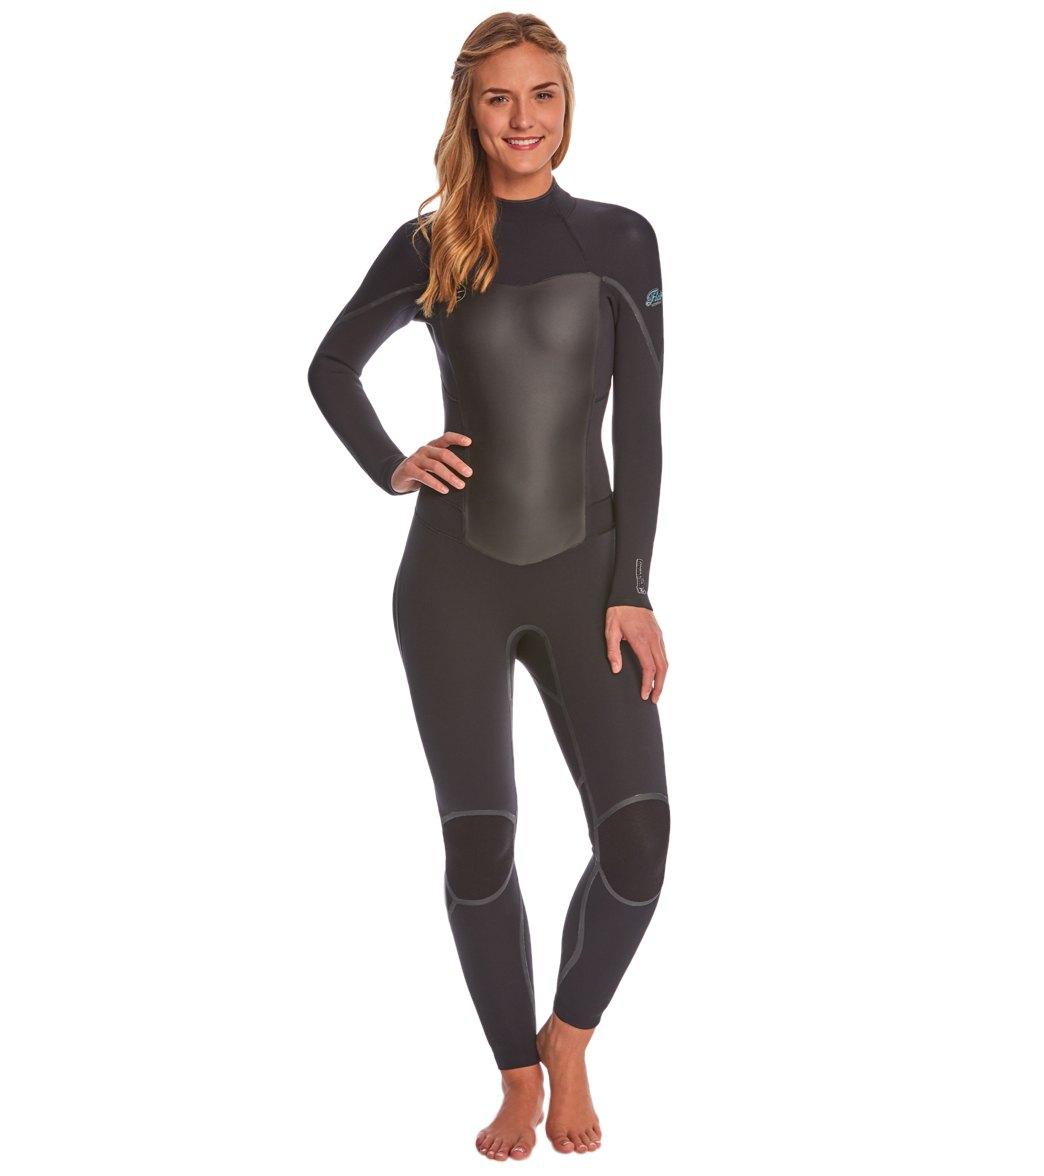 womens Back Zip Fullsuit Wetsuit